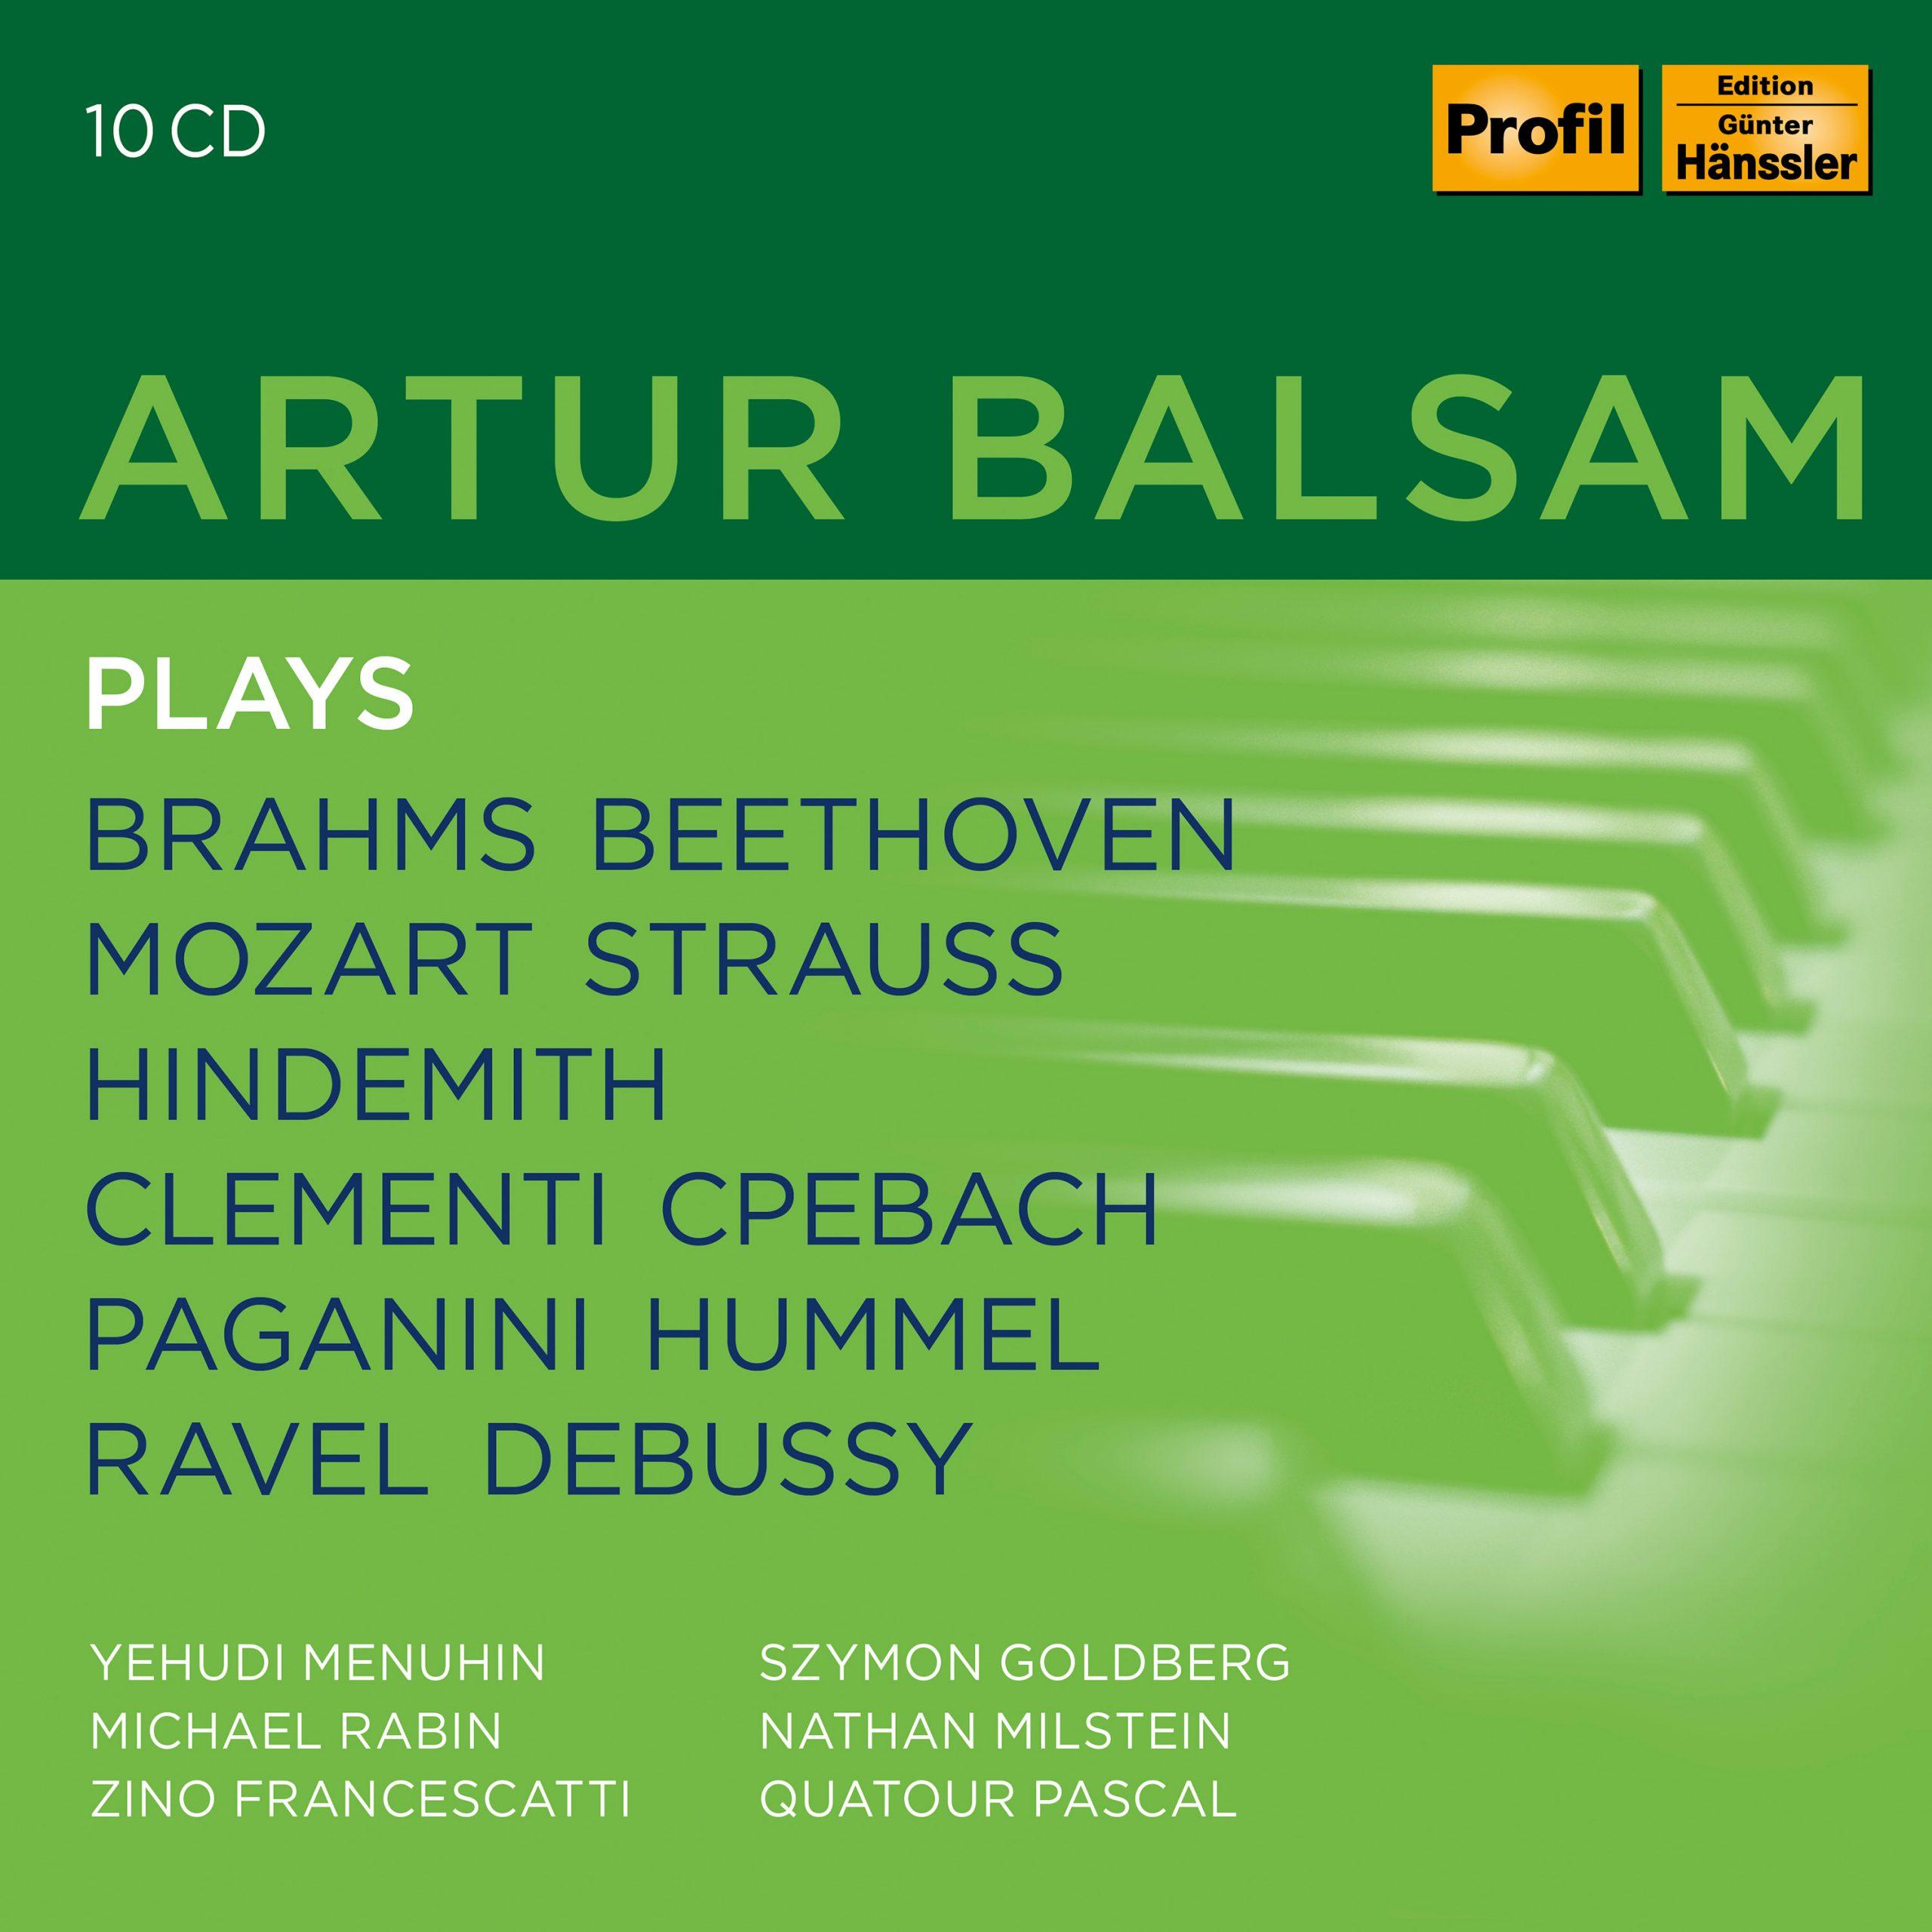 ARTUR BALSAM PLAYS Balsam,Artur/+